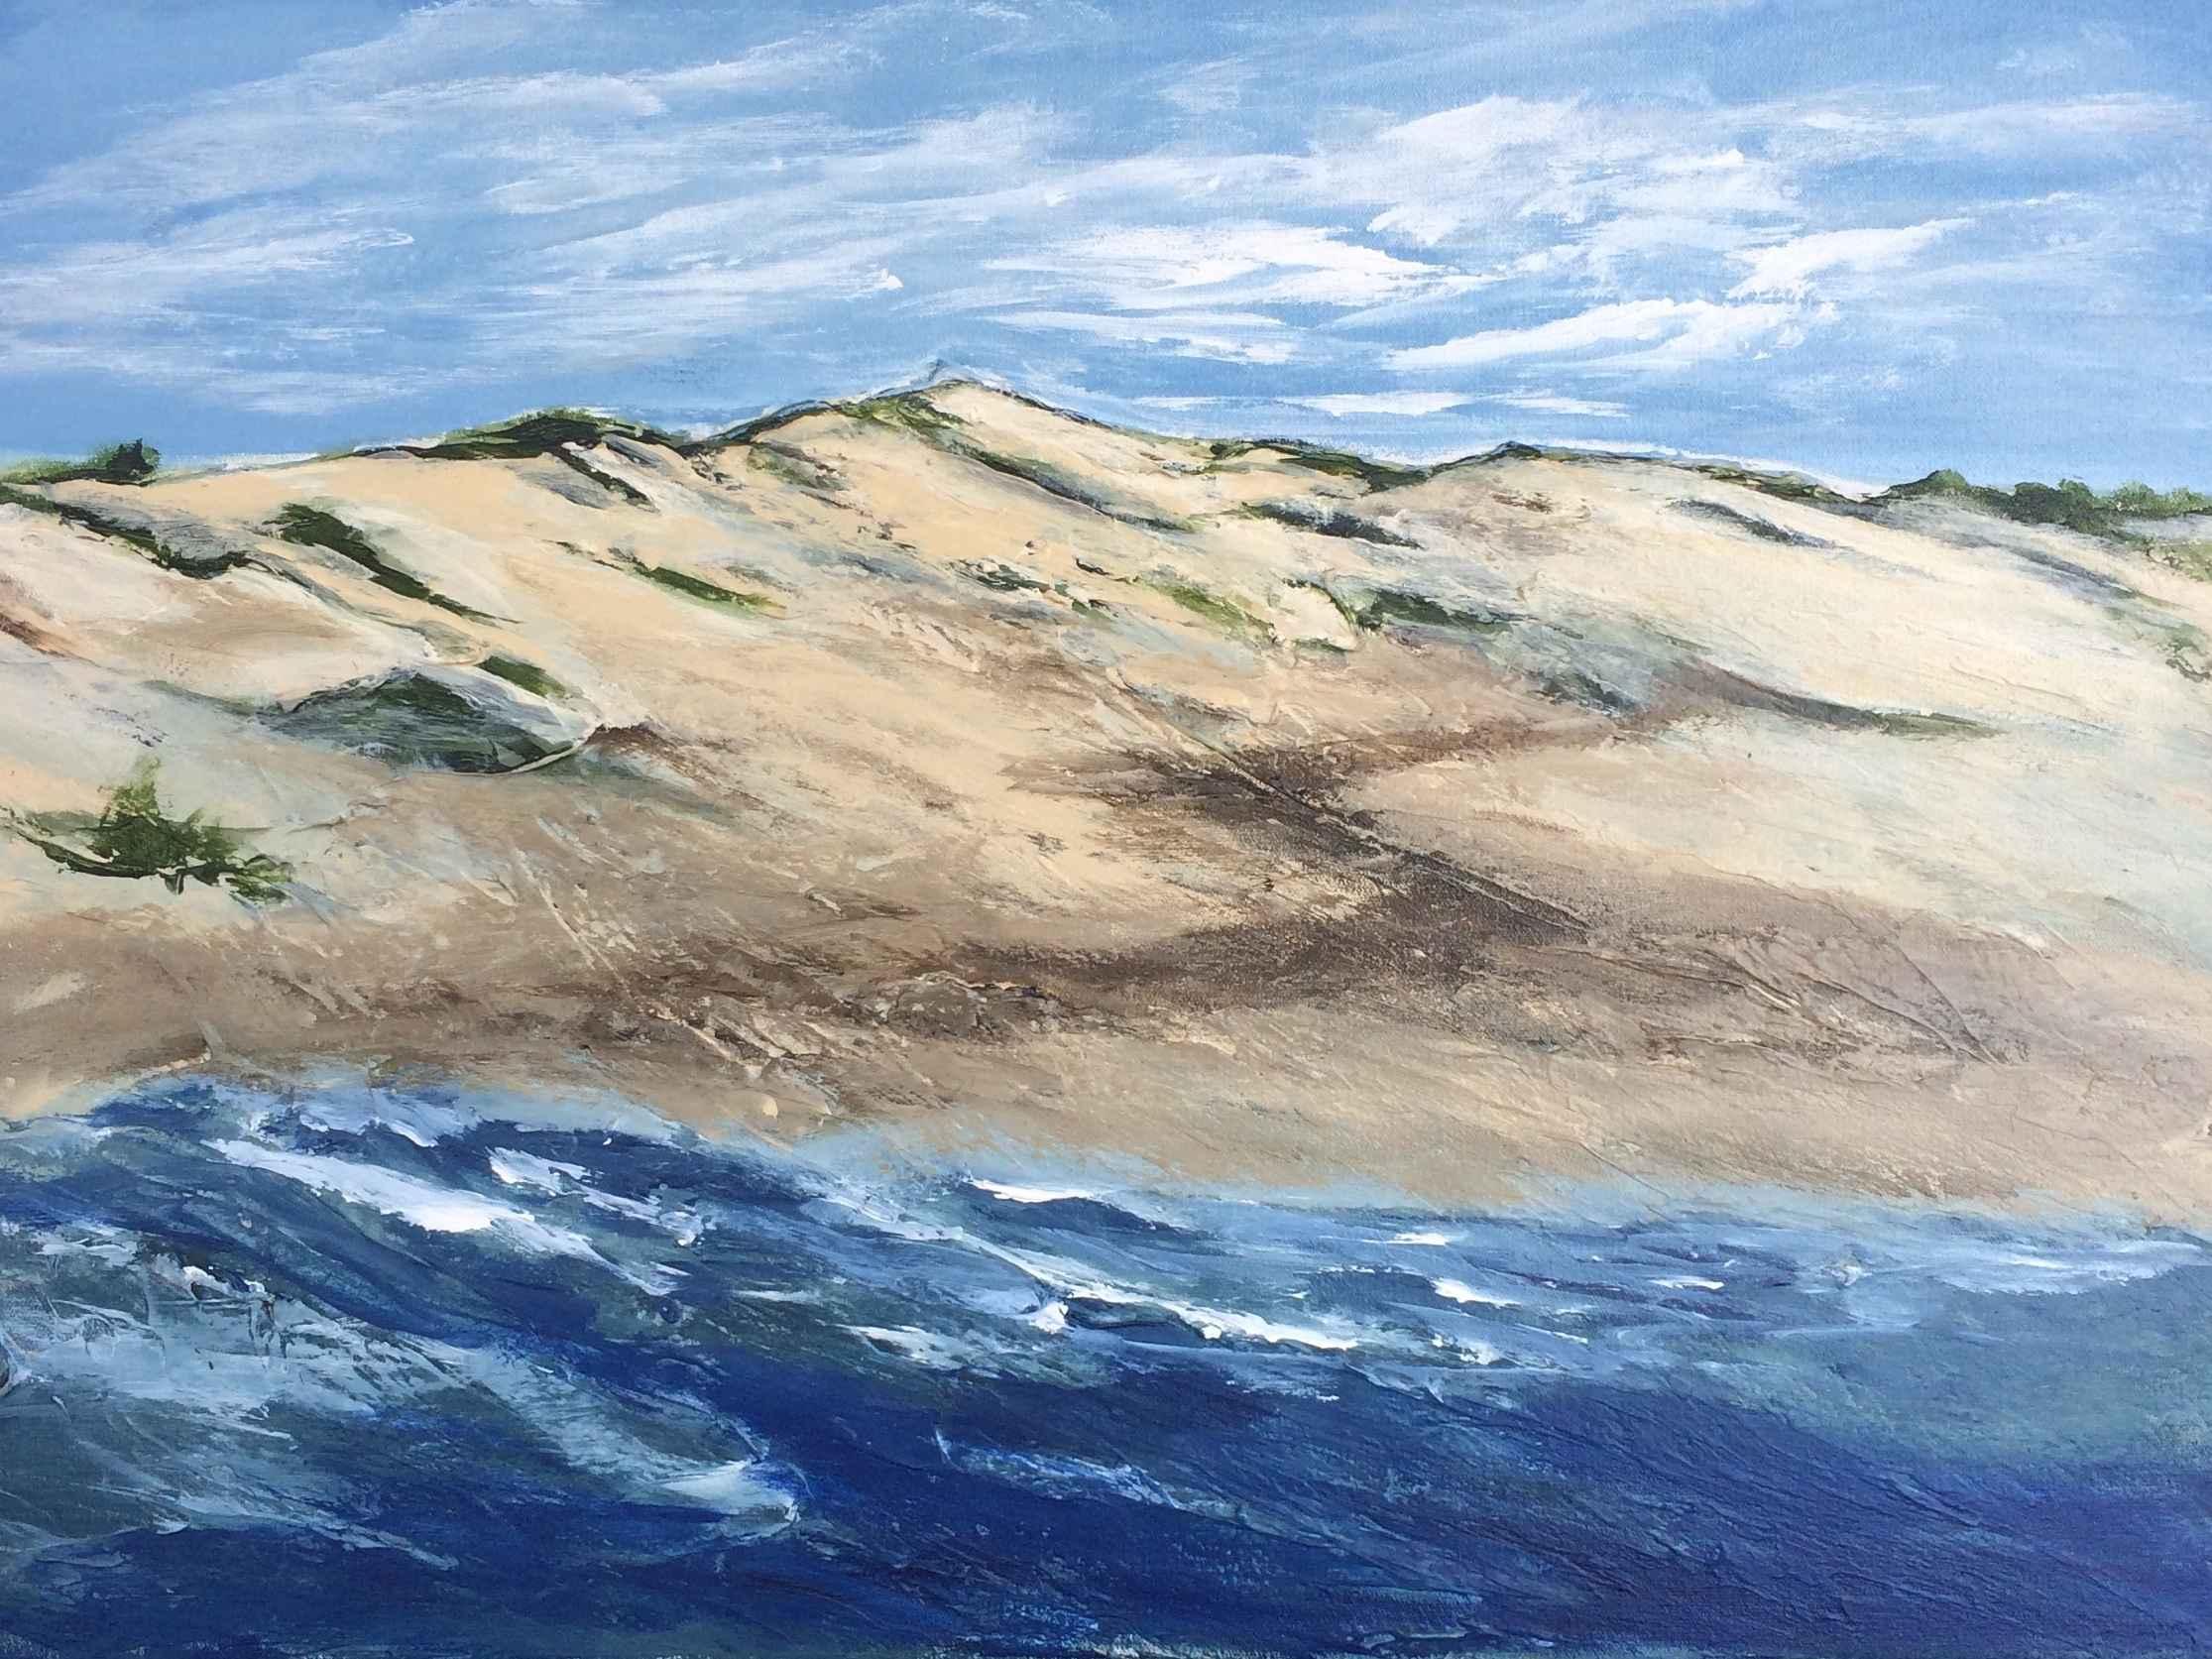 The Journey Onward by  Steve Lyons - Masterpiece Online